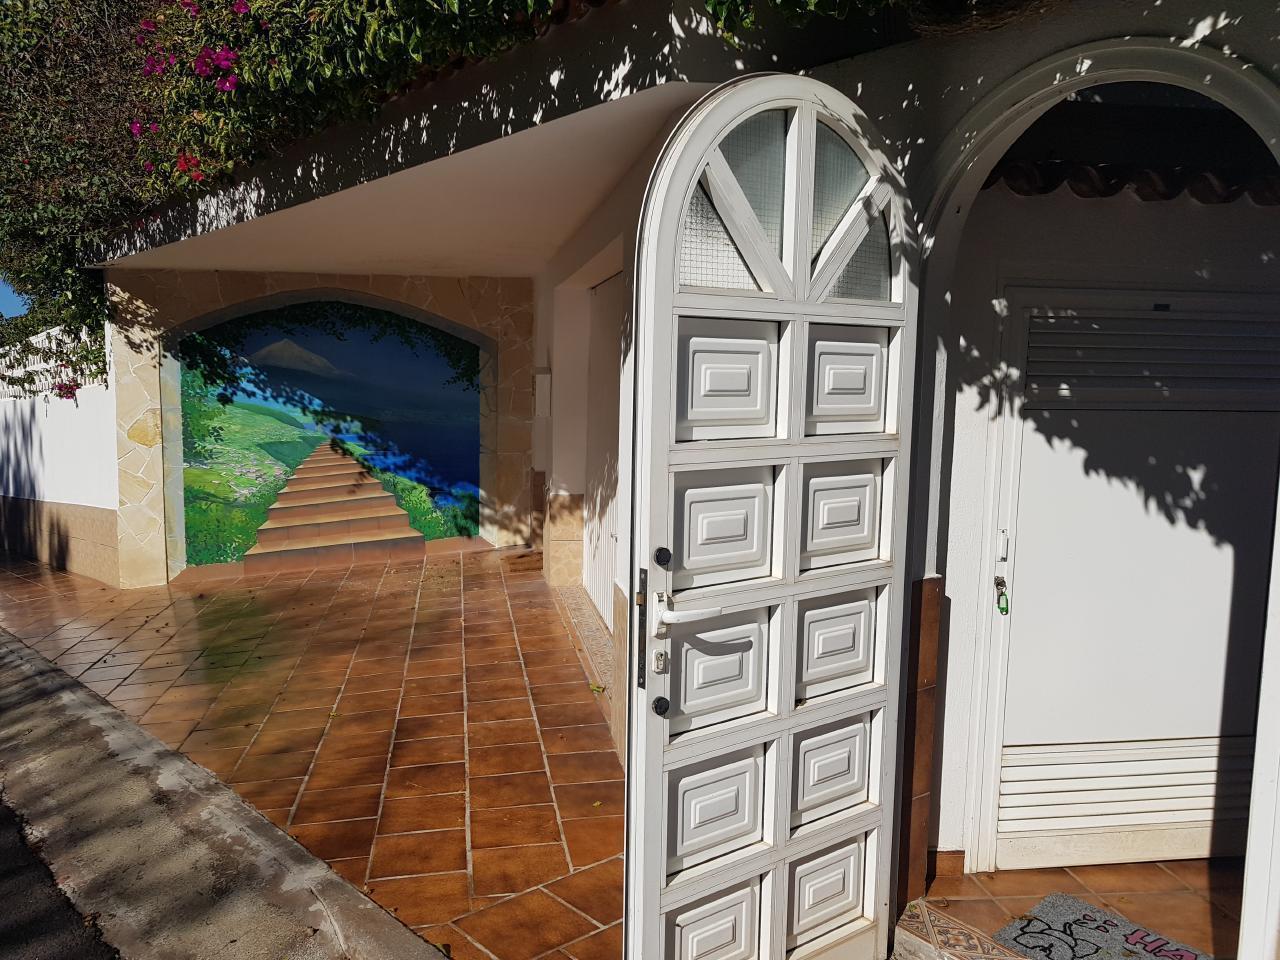 Appartement de vacances Villa Larnia Familien Apartment   * Urlaub für Körper, Geist und Seele * (2529406), El Sauzal, Ténérife, Iles Canaries, Espagne, image 2